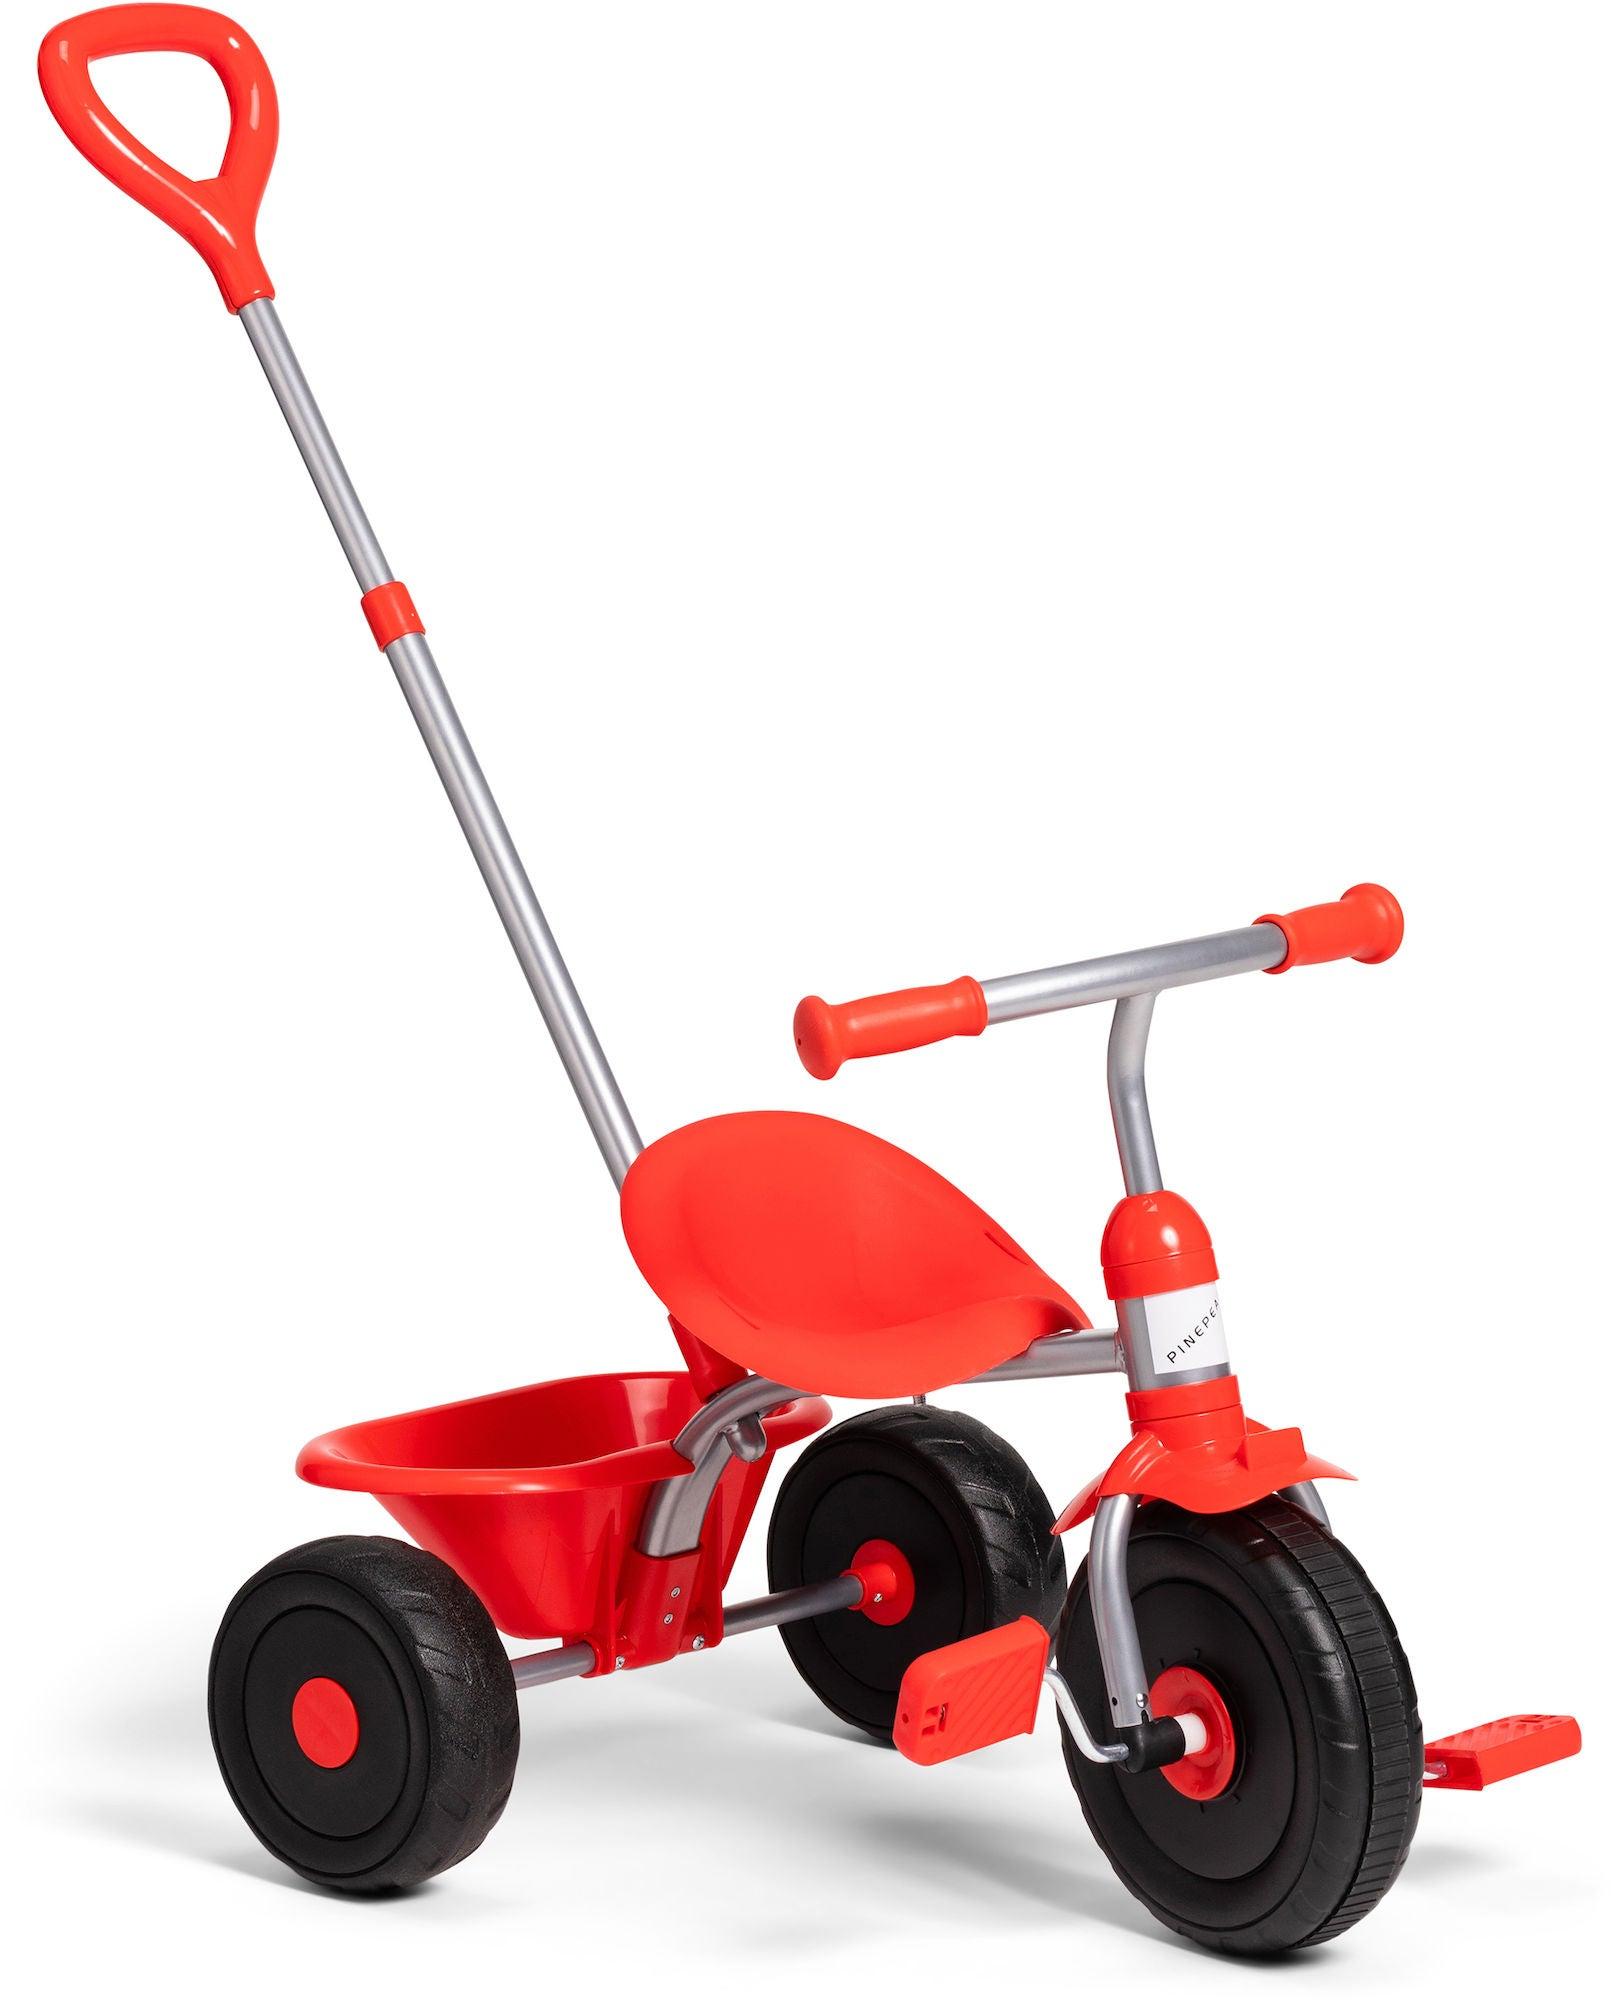 Pinepeak Trehjuling Med Handtag, Röd